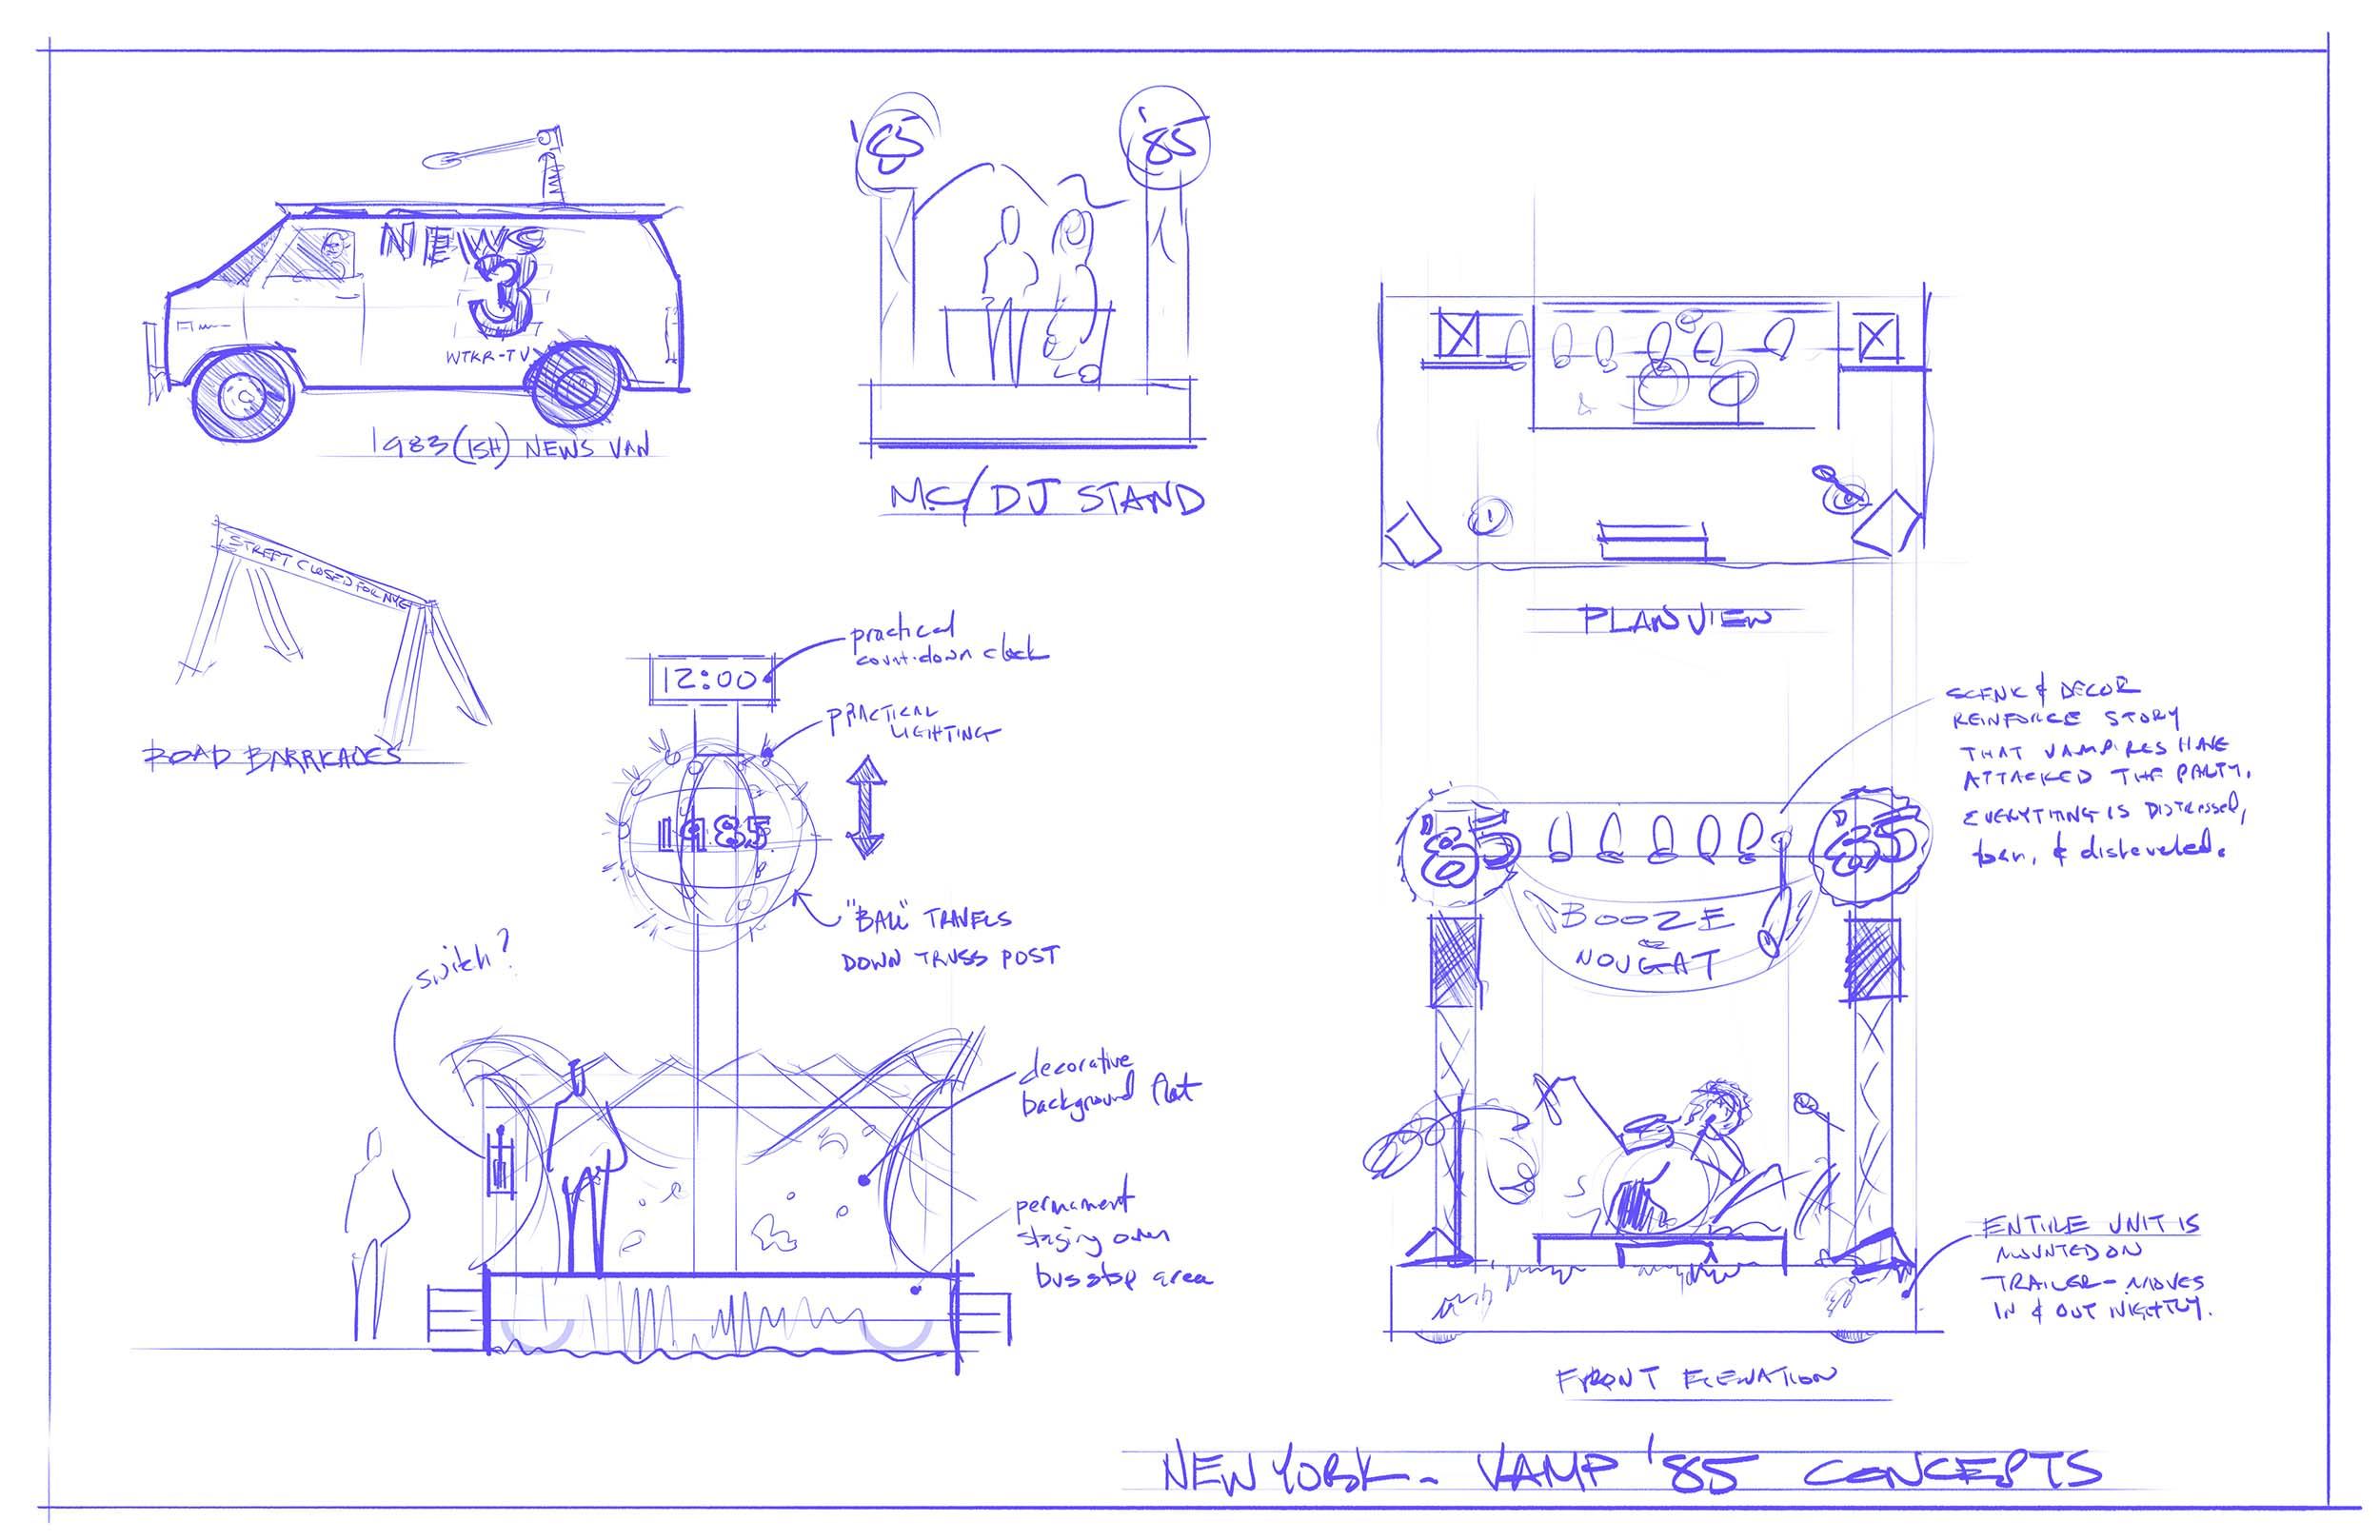 Vamp 1985 Brainstorm.jpg